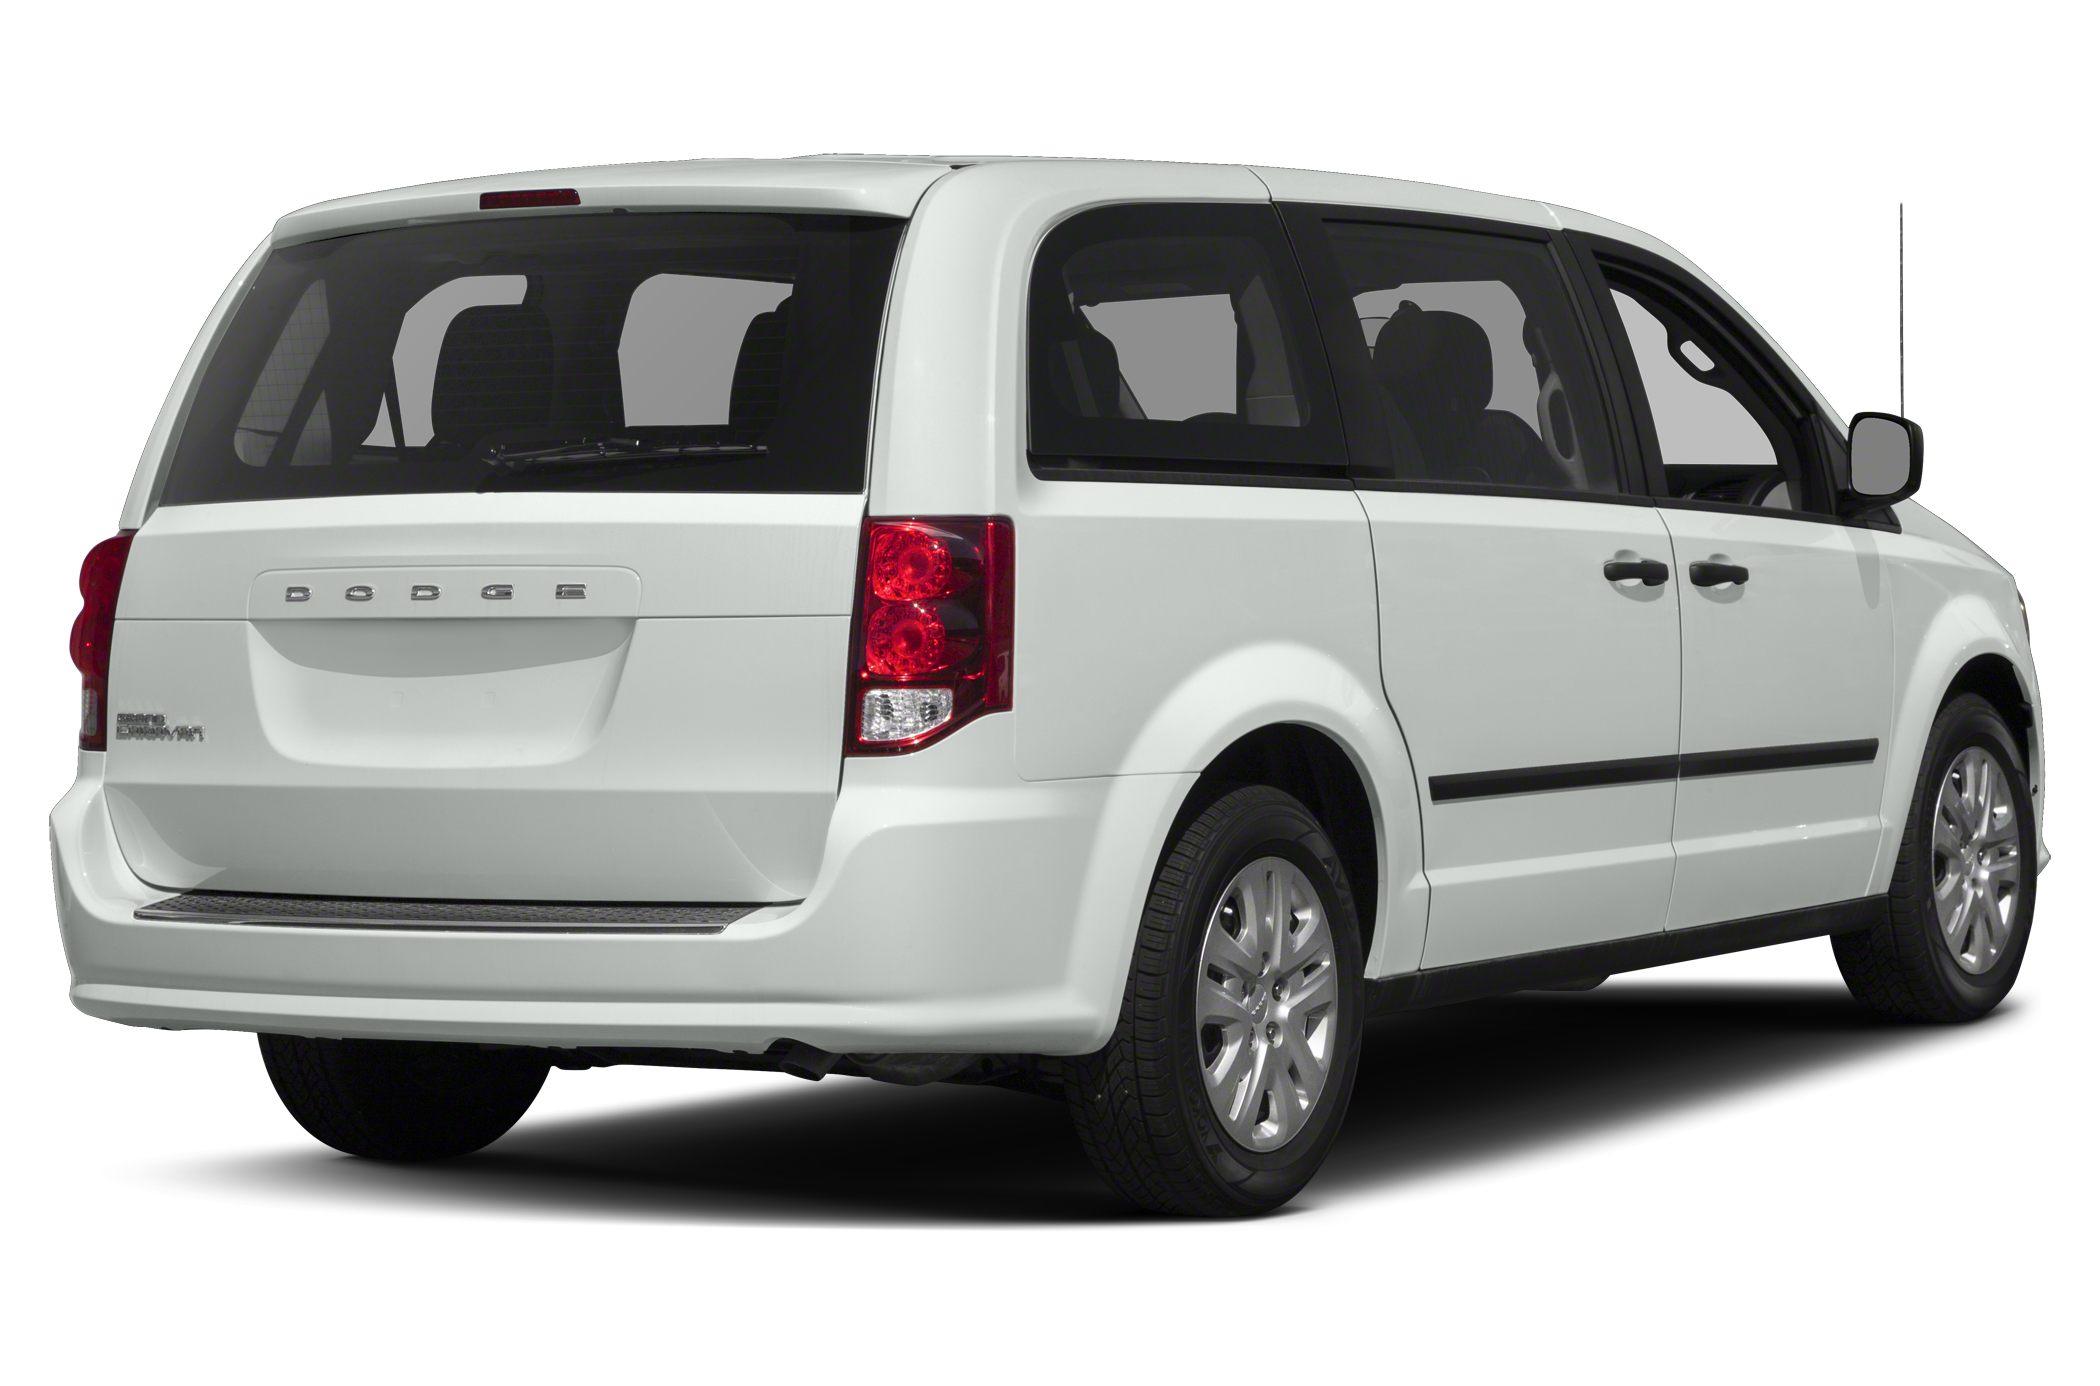 2017 Dodge Grand Caravan Reviews, Specs and Prices   Cars.com